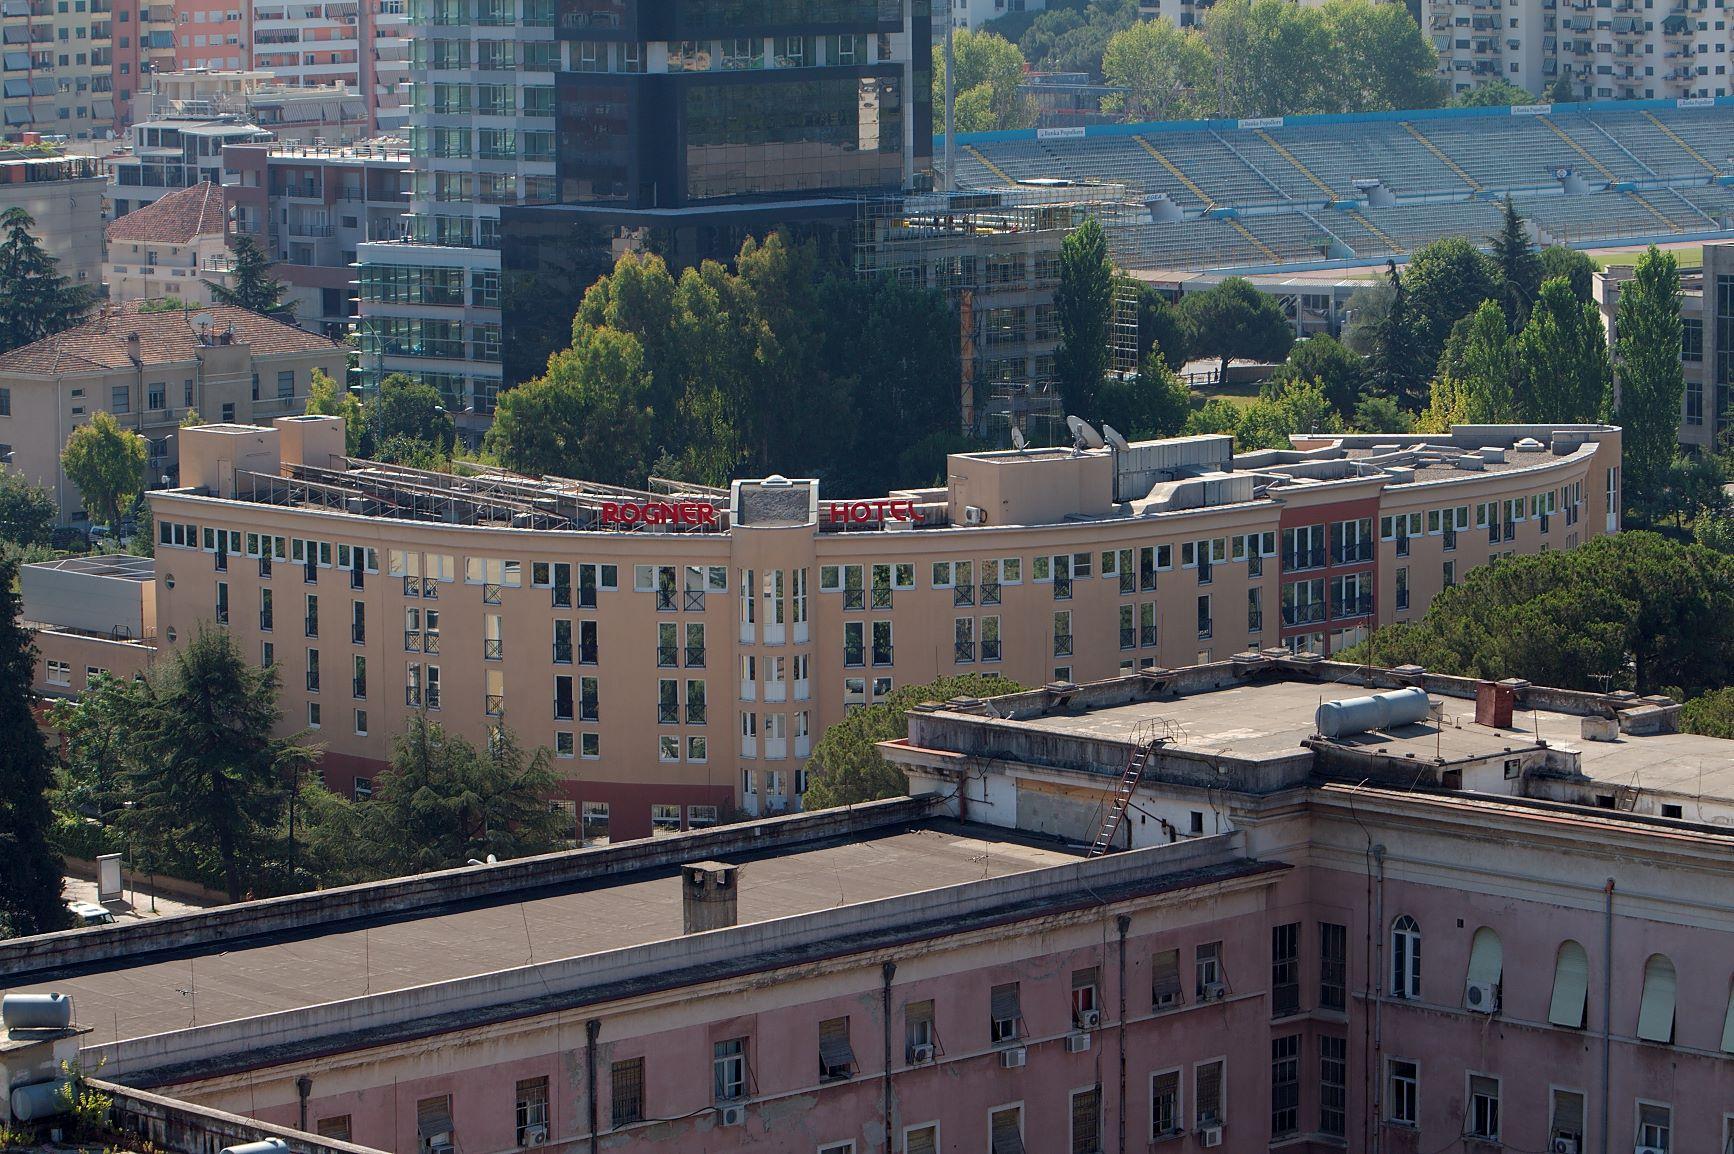 Rogner Hotel Tirana Wikipedia